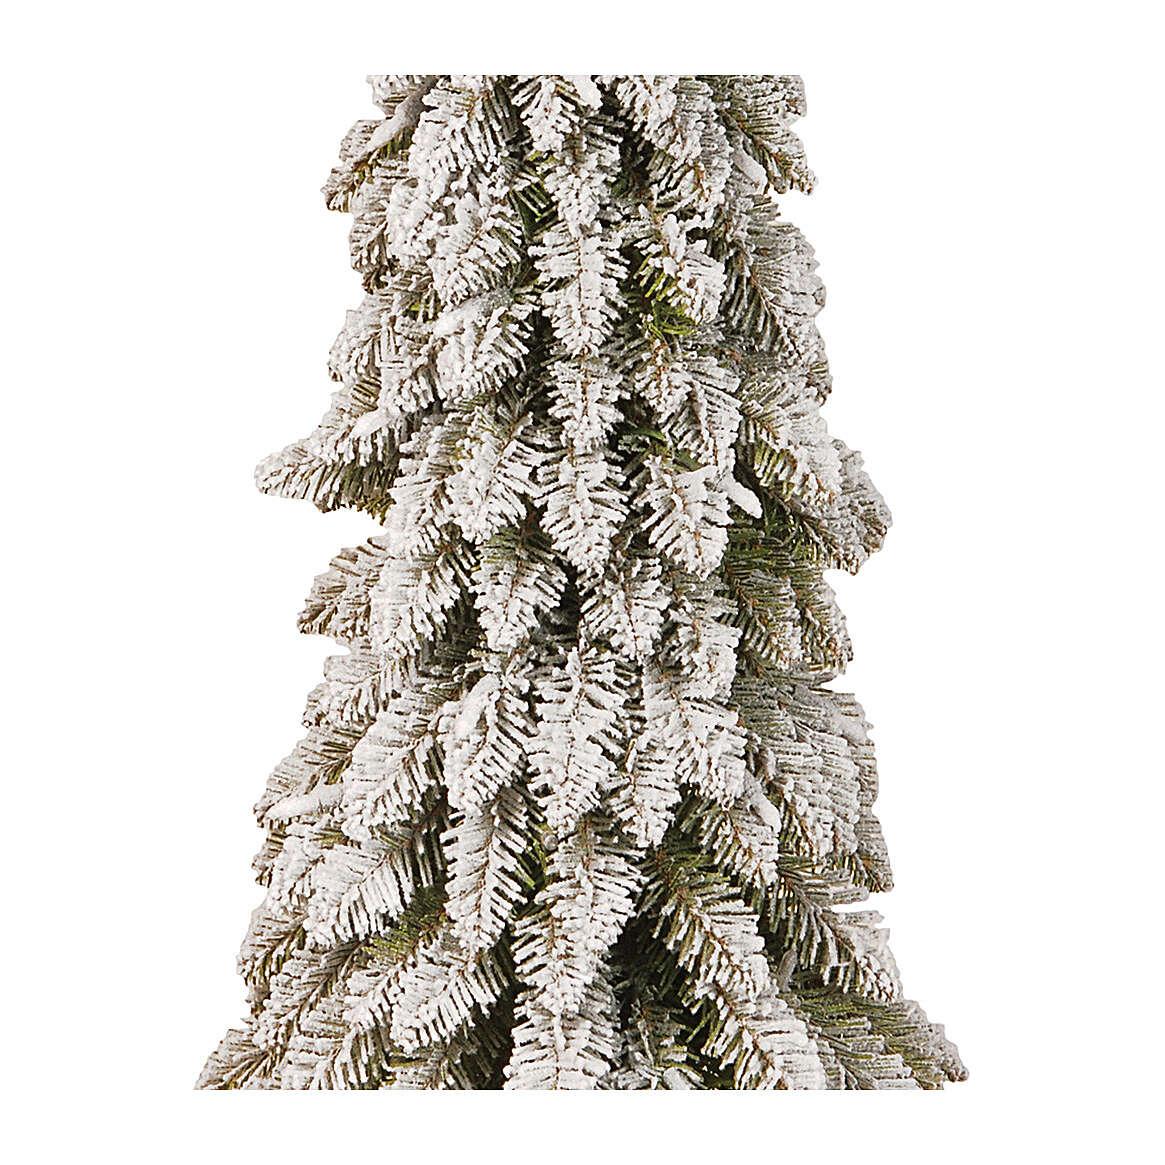 Albero di Natale 60 cm Downswept Forestree Flocked 3